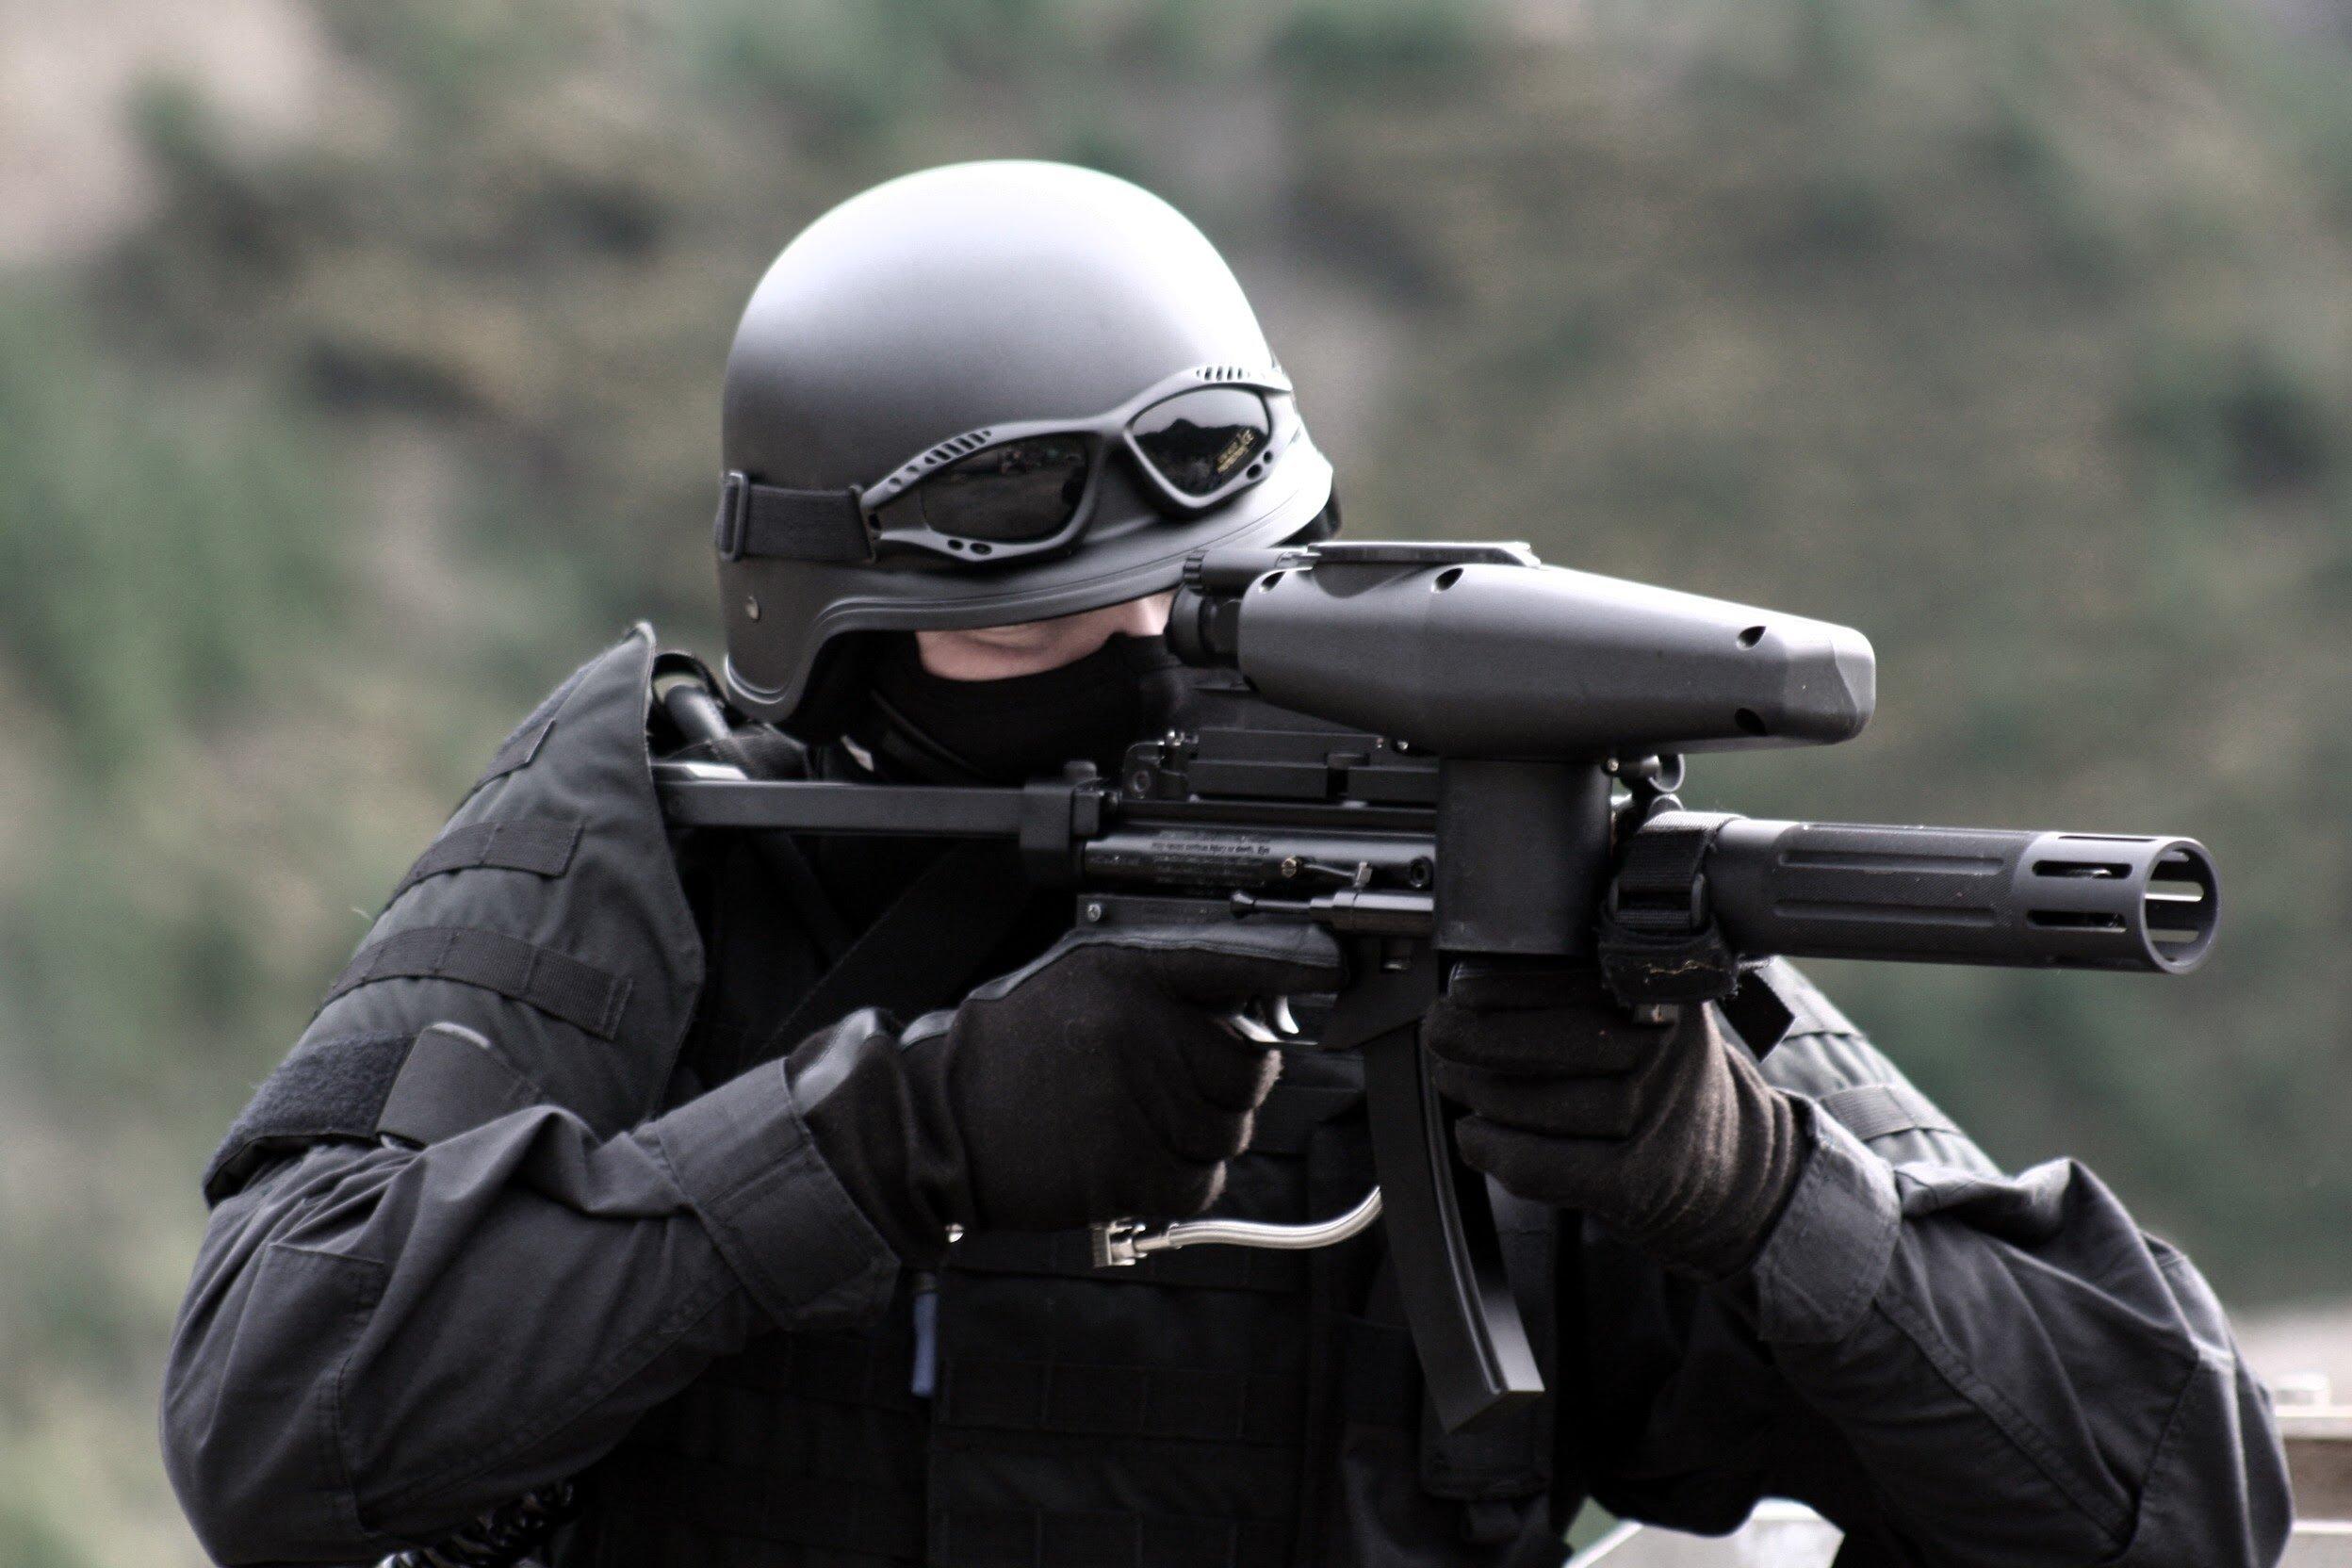 SWAT TEAM police crime emergency weapon gun wallpaper background 2496x1664